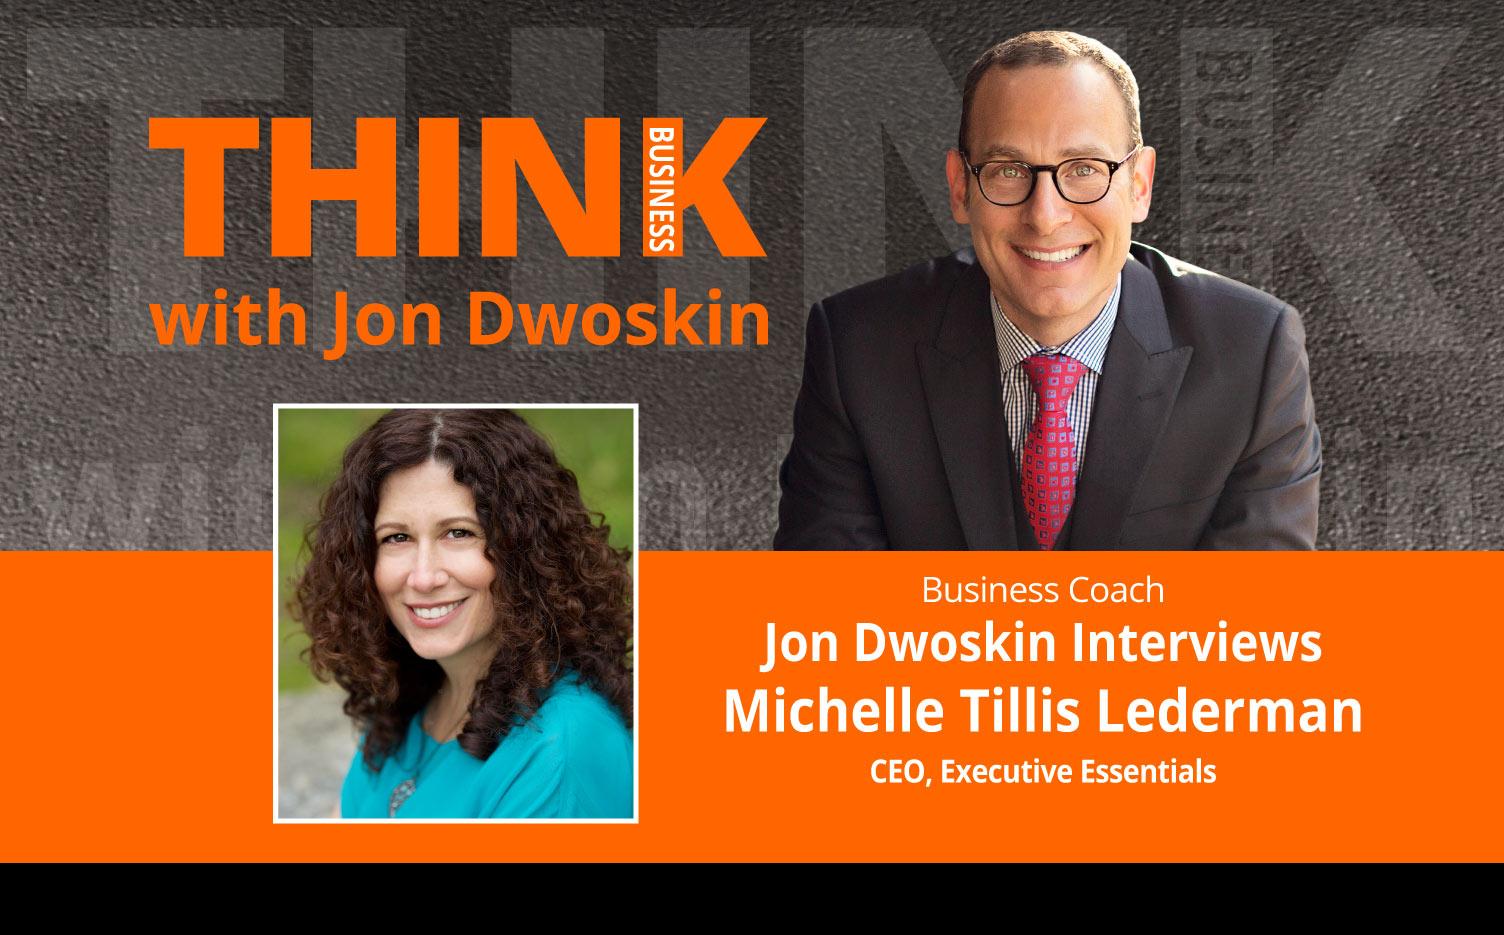 THINK Business Podcast: Jon Dwoskin Interviews Michelle Tillis Lederman, CEO, Executive Essentials